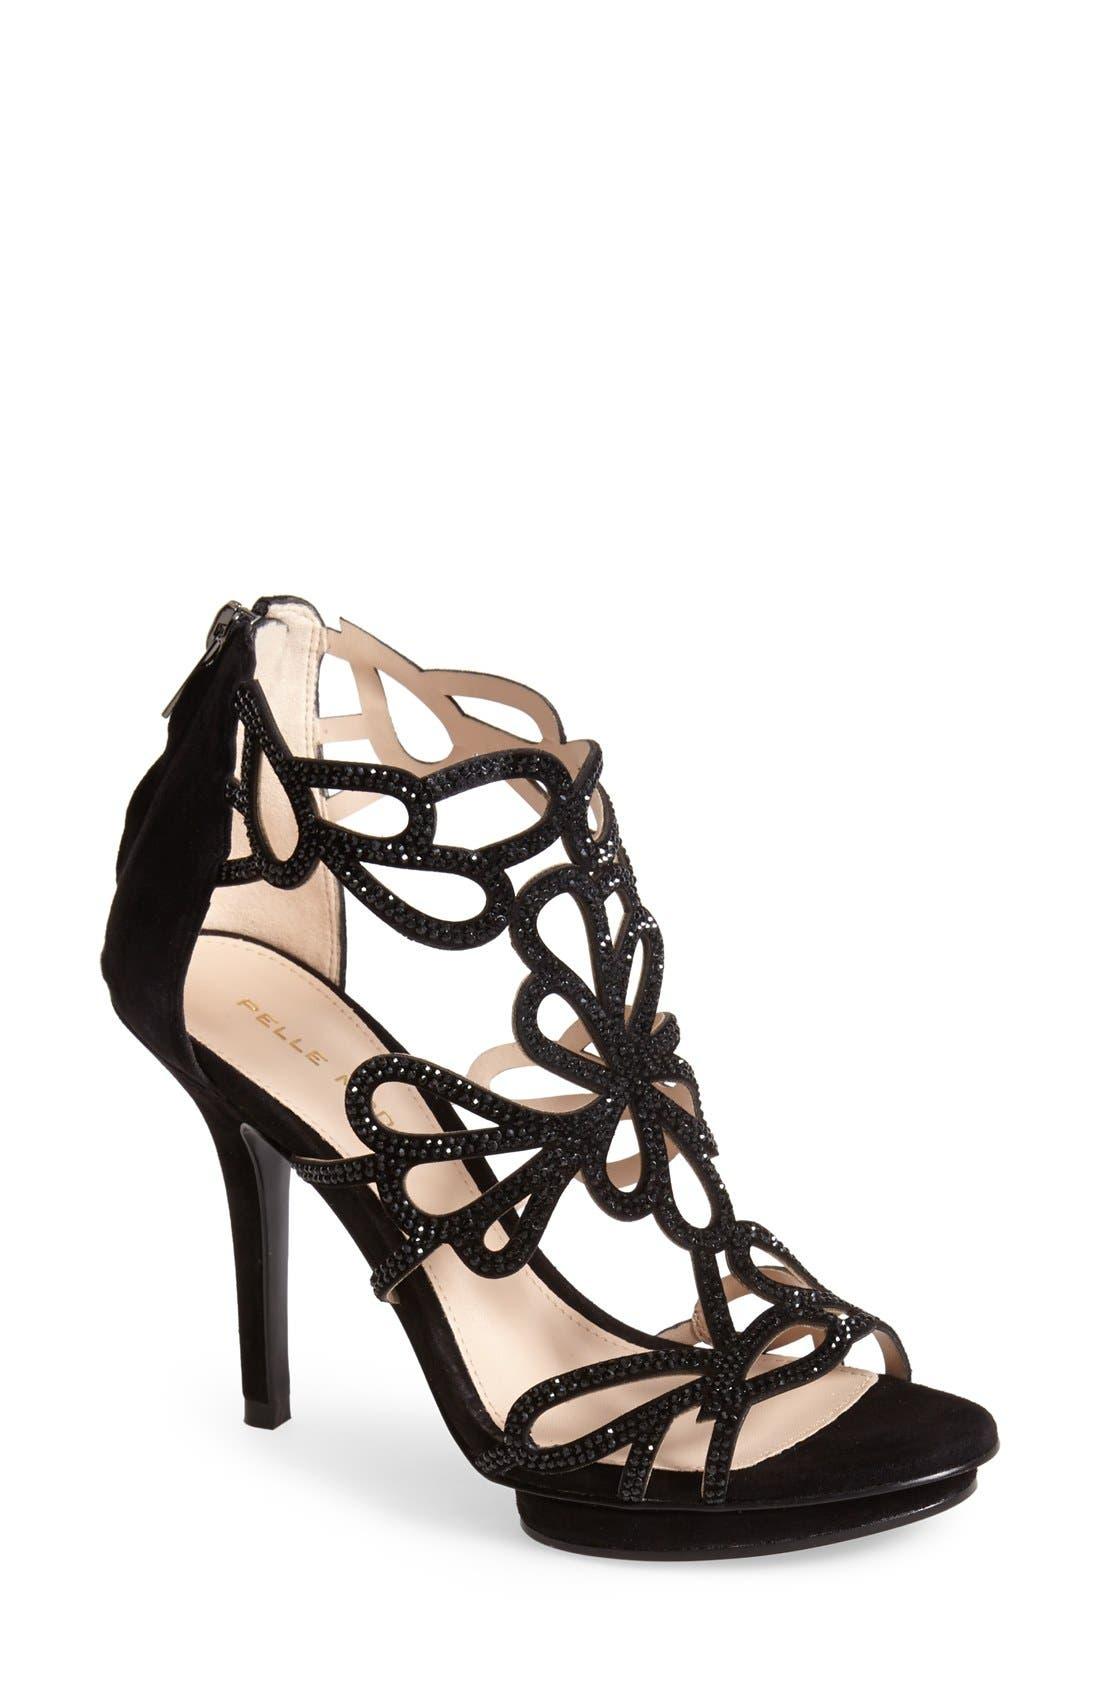 Alternate Image 1 Selected - Pelle Moda 'Ripley' Suede Platform Sandal (Women)